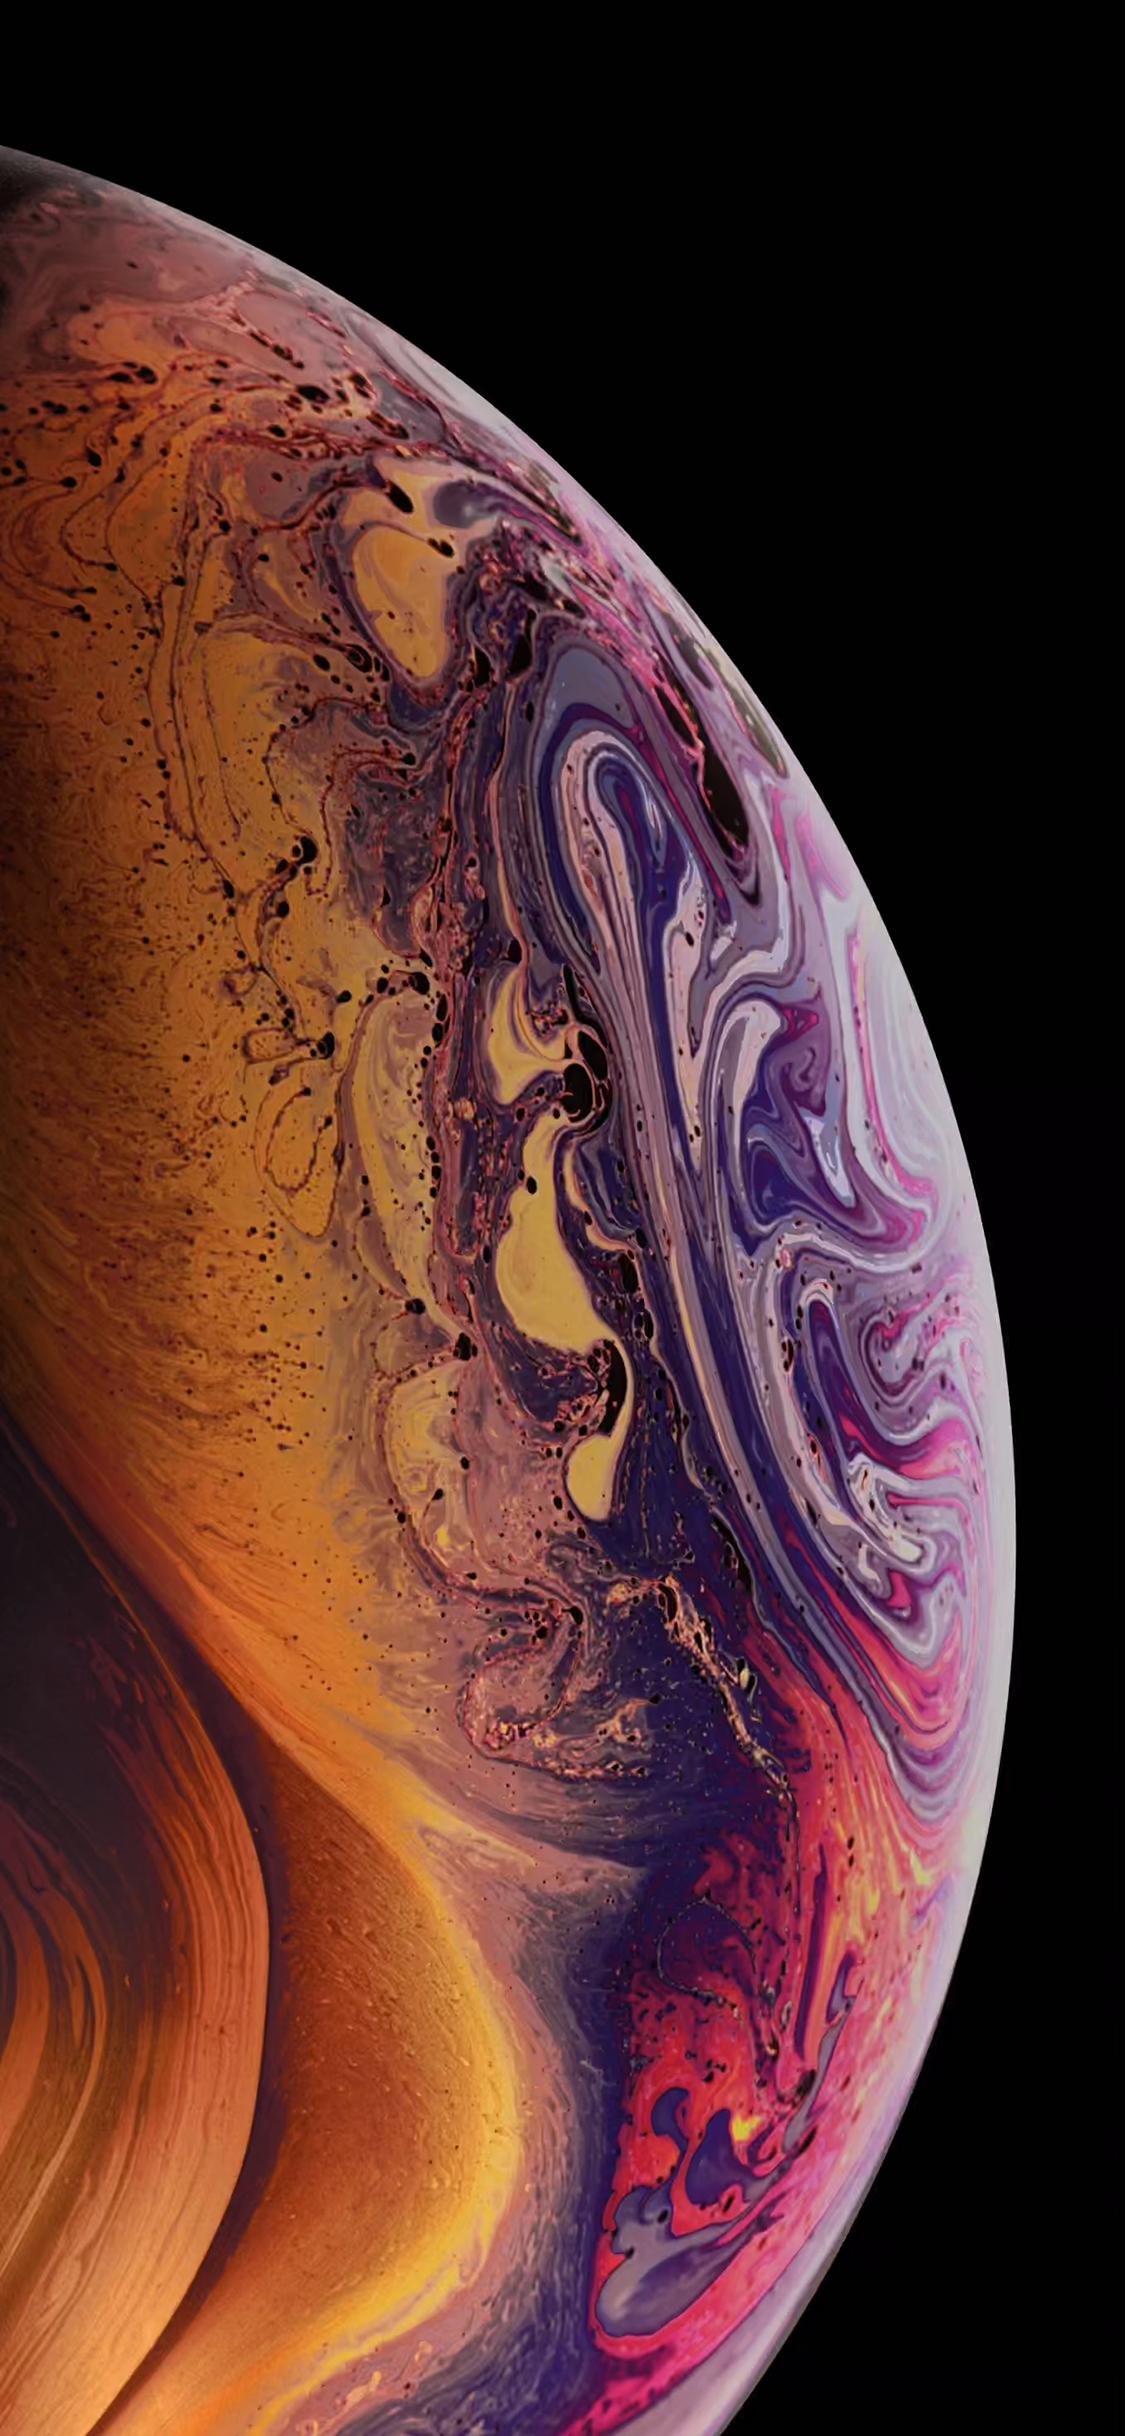 Lock Screen Wallpaper Iphone Xs Max